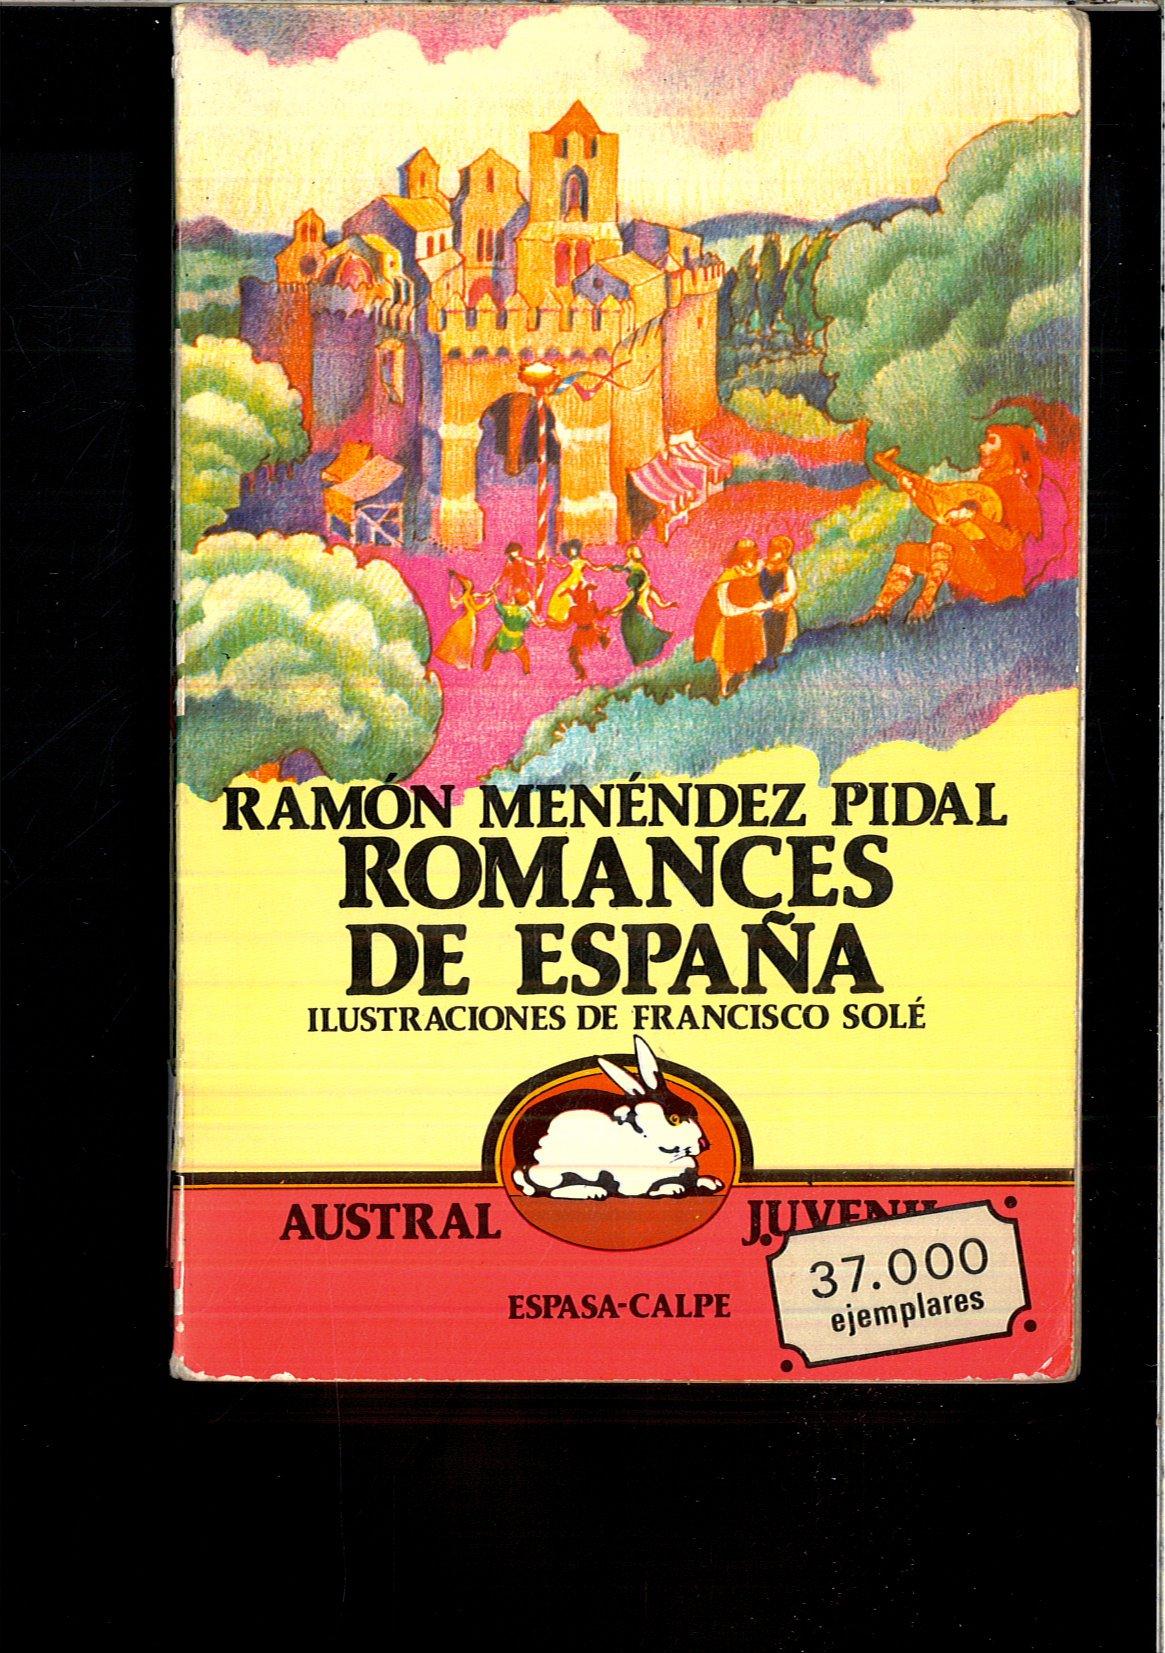 ROMANCES DE ESPAÑA: Amazon.es: RAMON MENENDEZ PIDAL: Libros